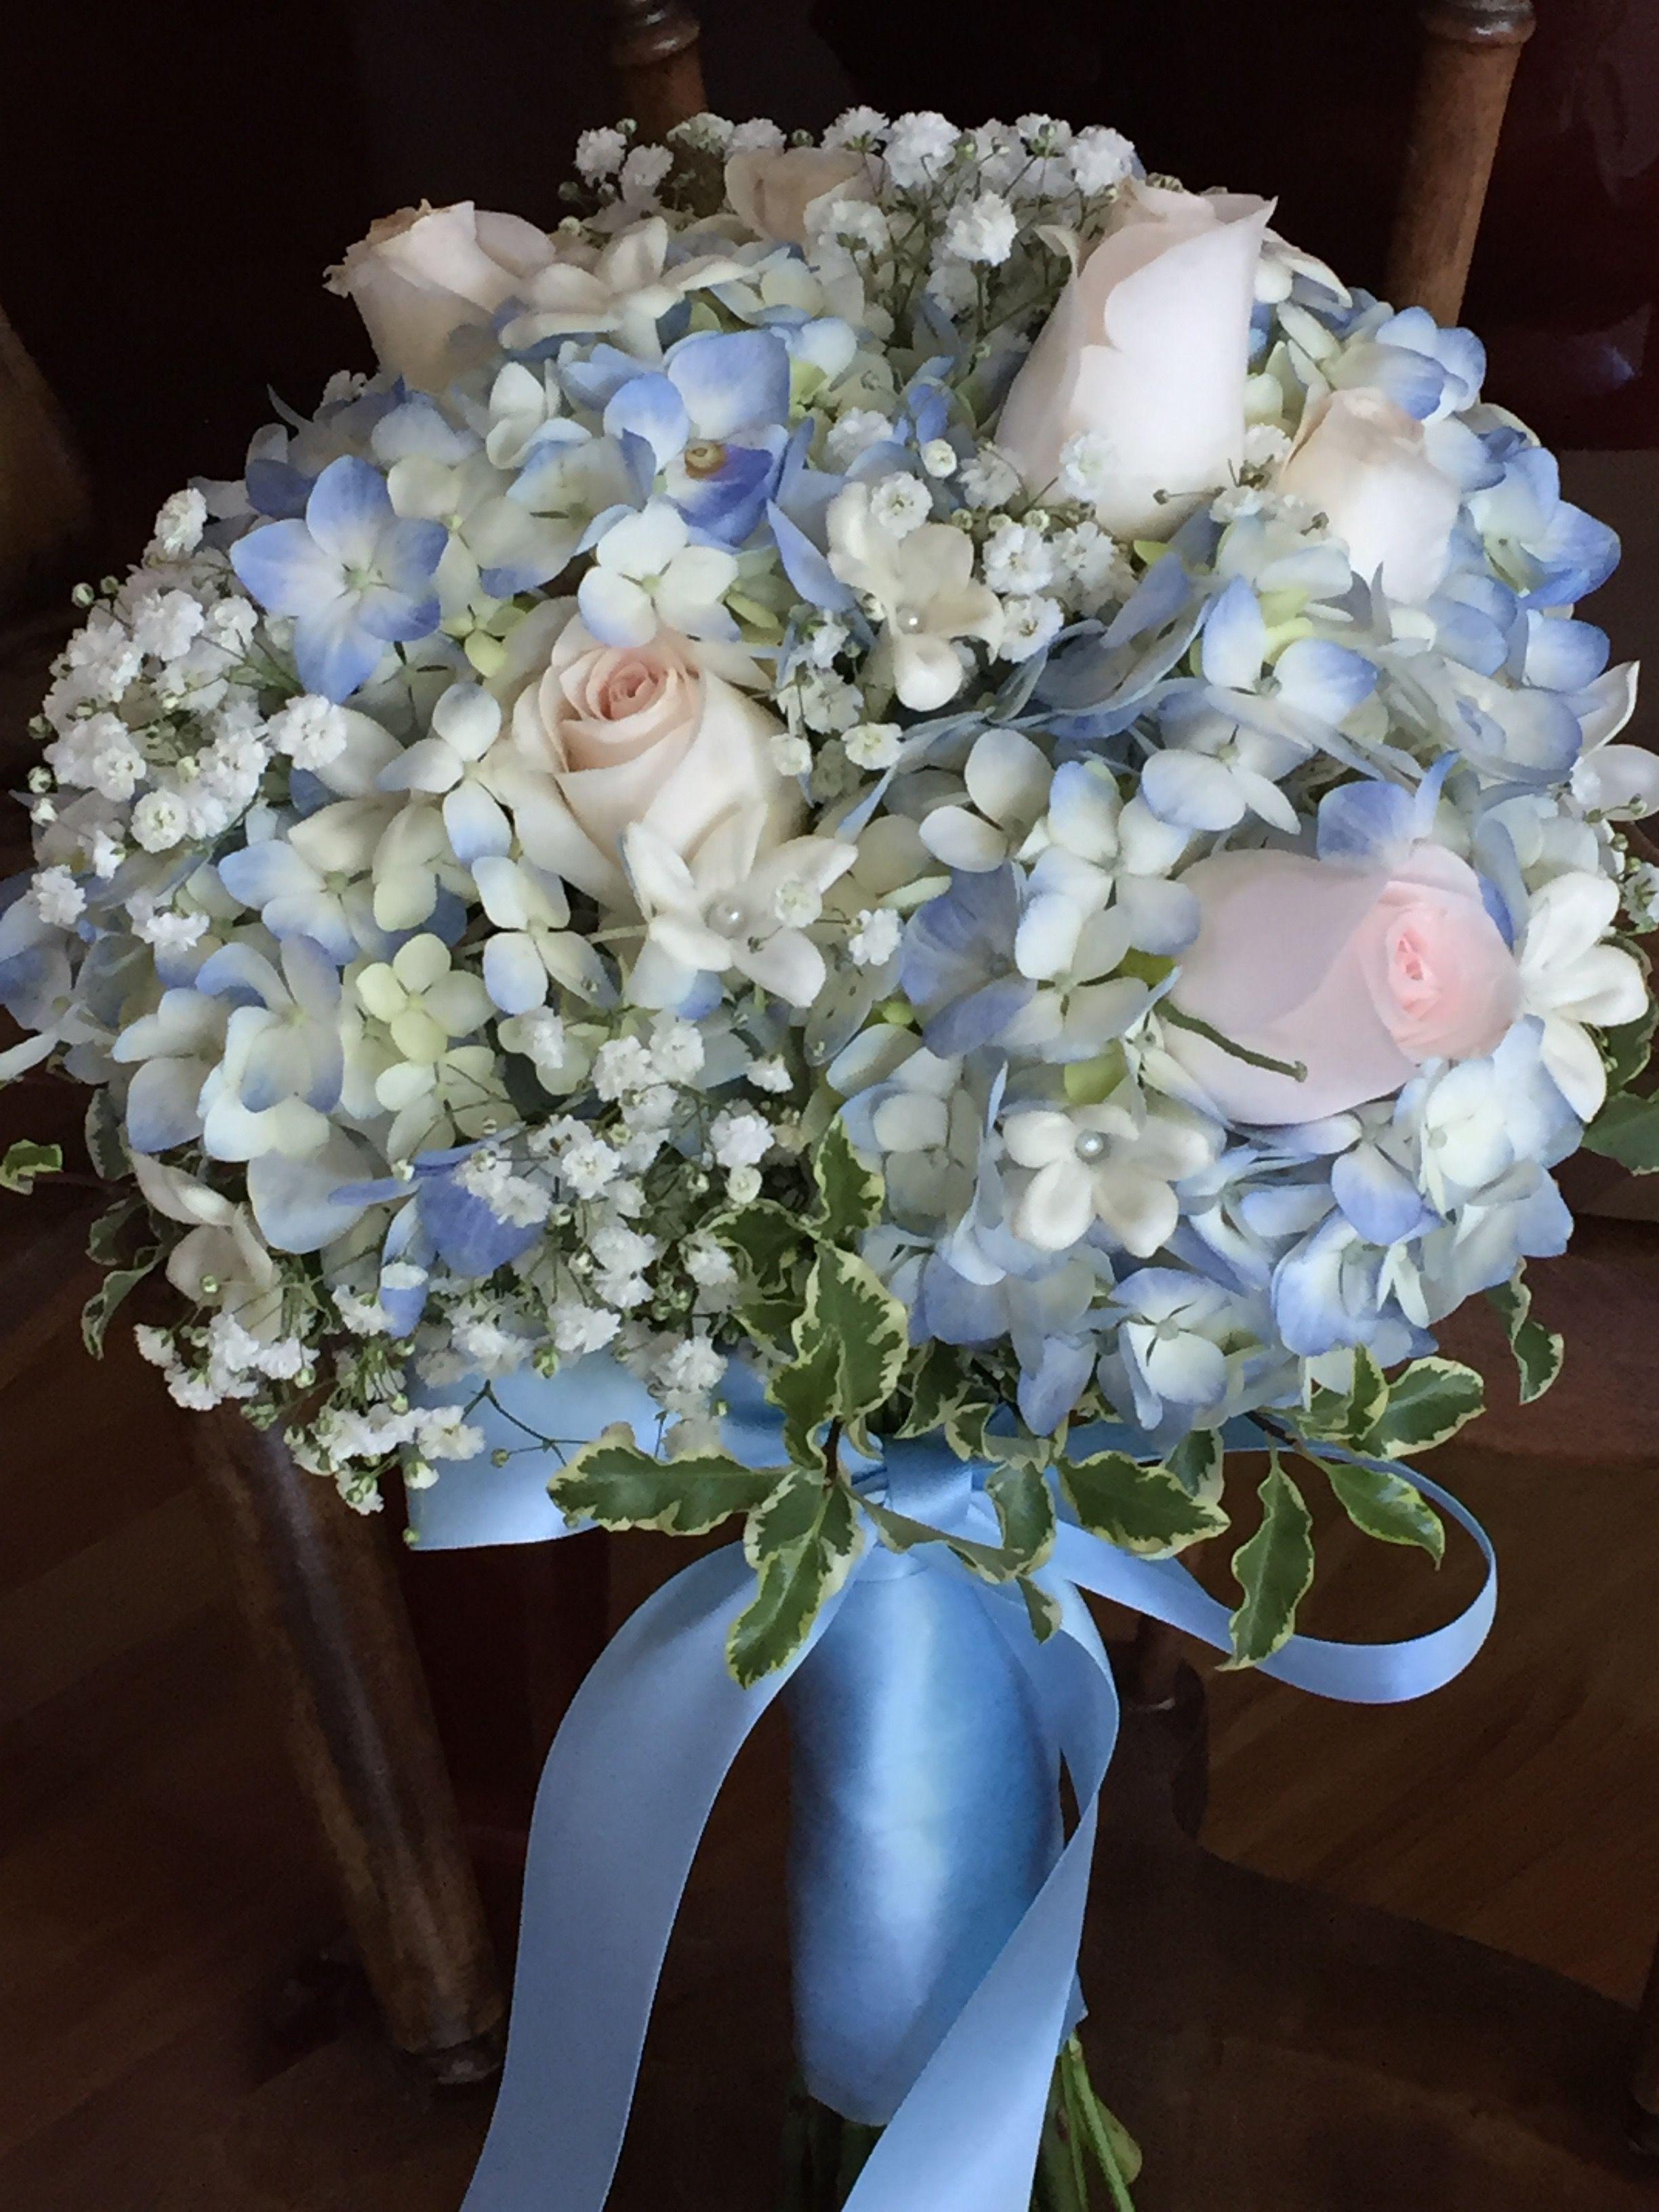 Soft Blue Hydrangea Blush Pink Roses Stephanotis And